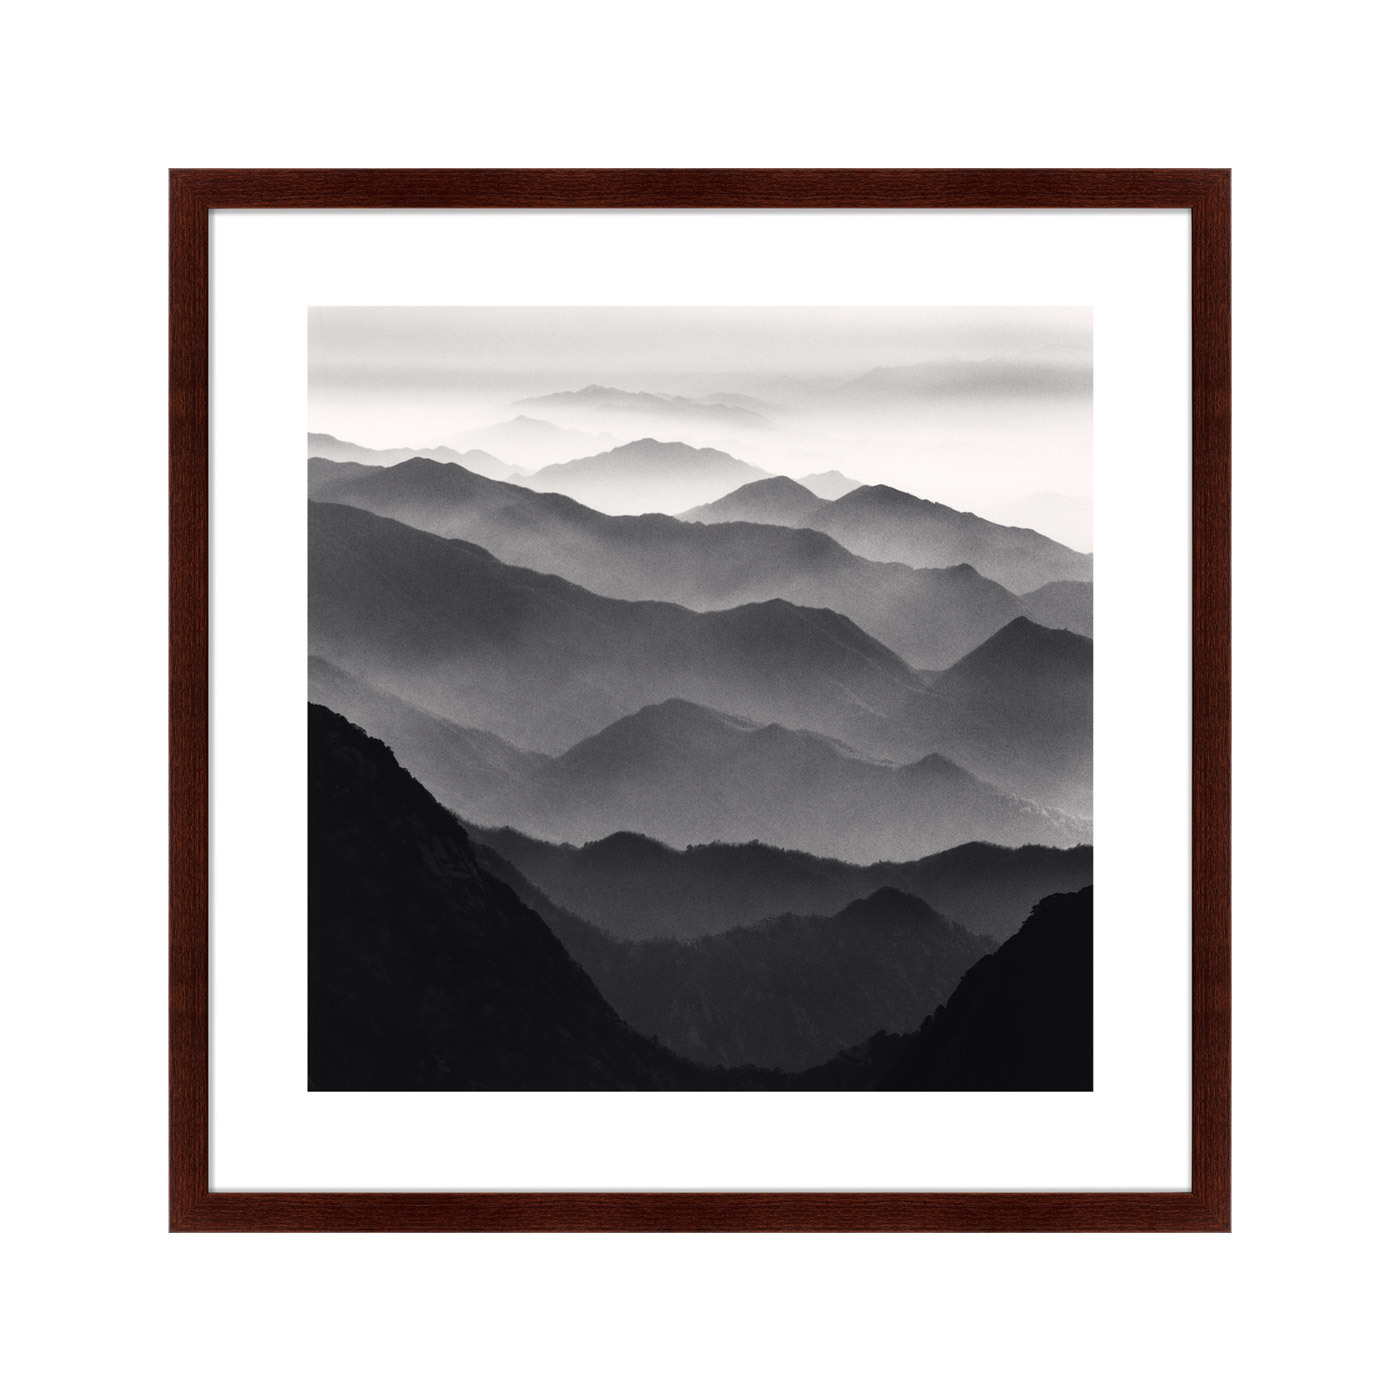 {} Картины в Квартиру Картина Huangshan Mountains (79х79 см) картины в квартиру картина опасные домохозяйки 2 35х35 см